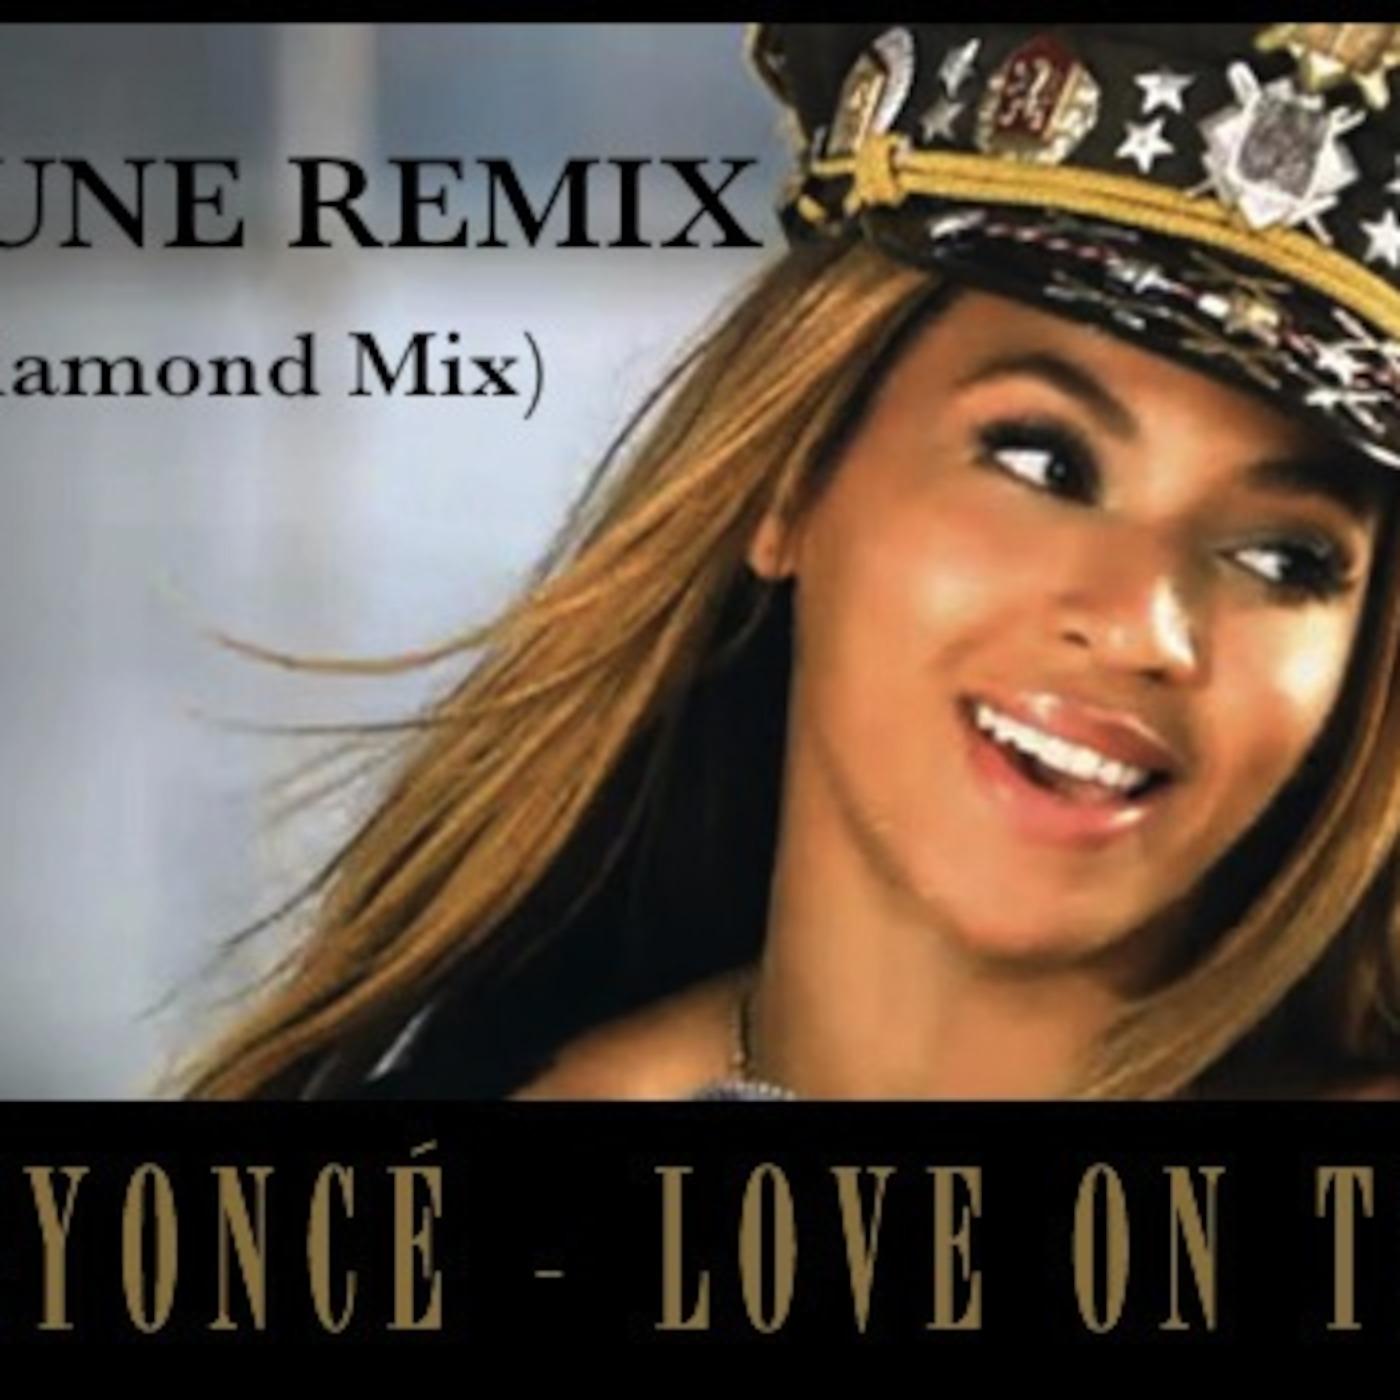 Main Woh Duniya Hoon Song Download Mp3 Song: Love On Top Download Songs